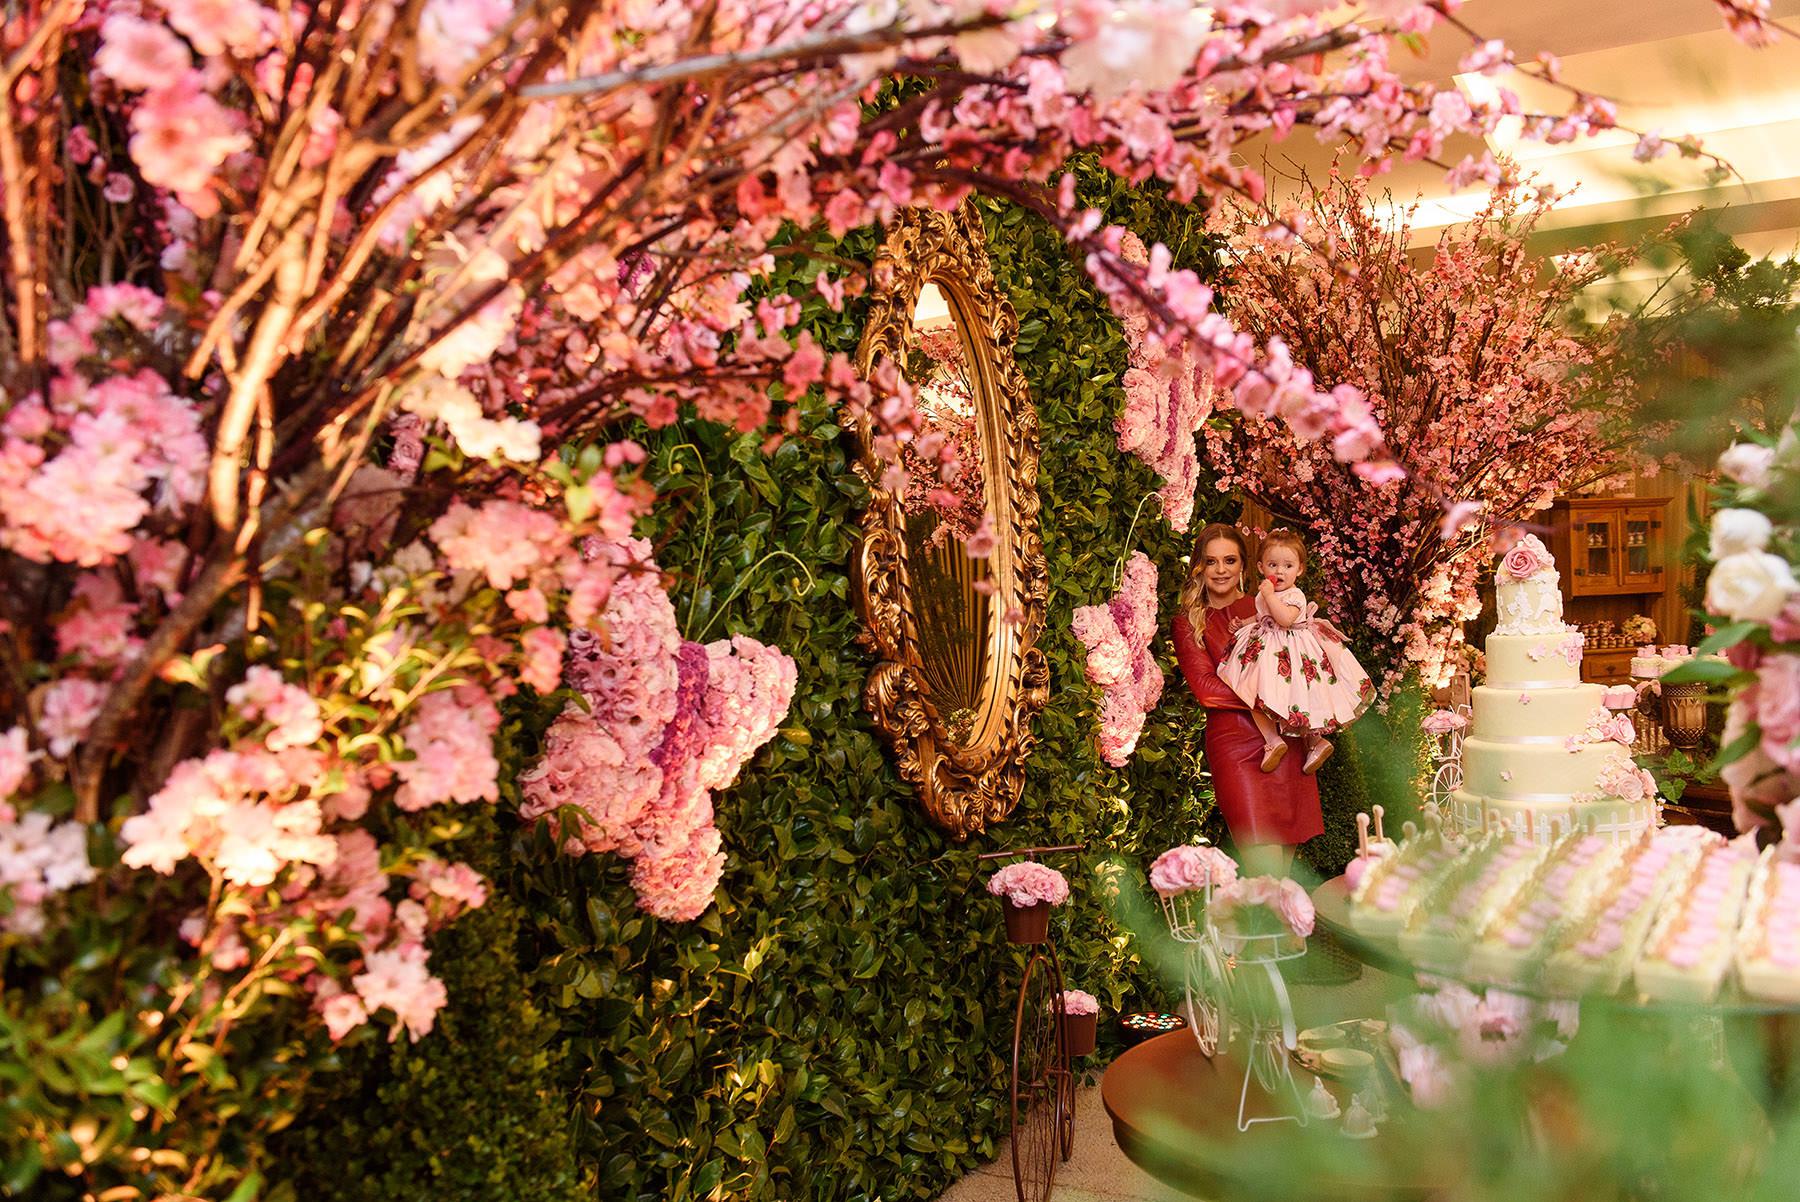 49-festa-infantil-curitiba-1aninho-bruna-winter-graciosa-lukrizanowski.jpg